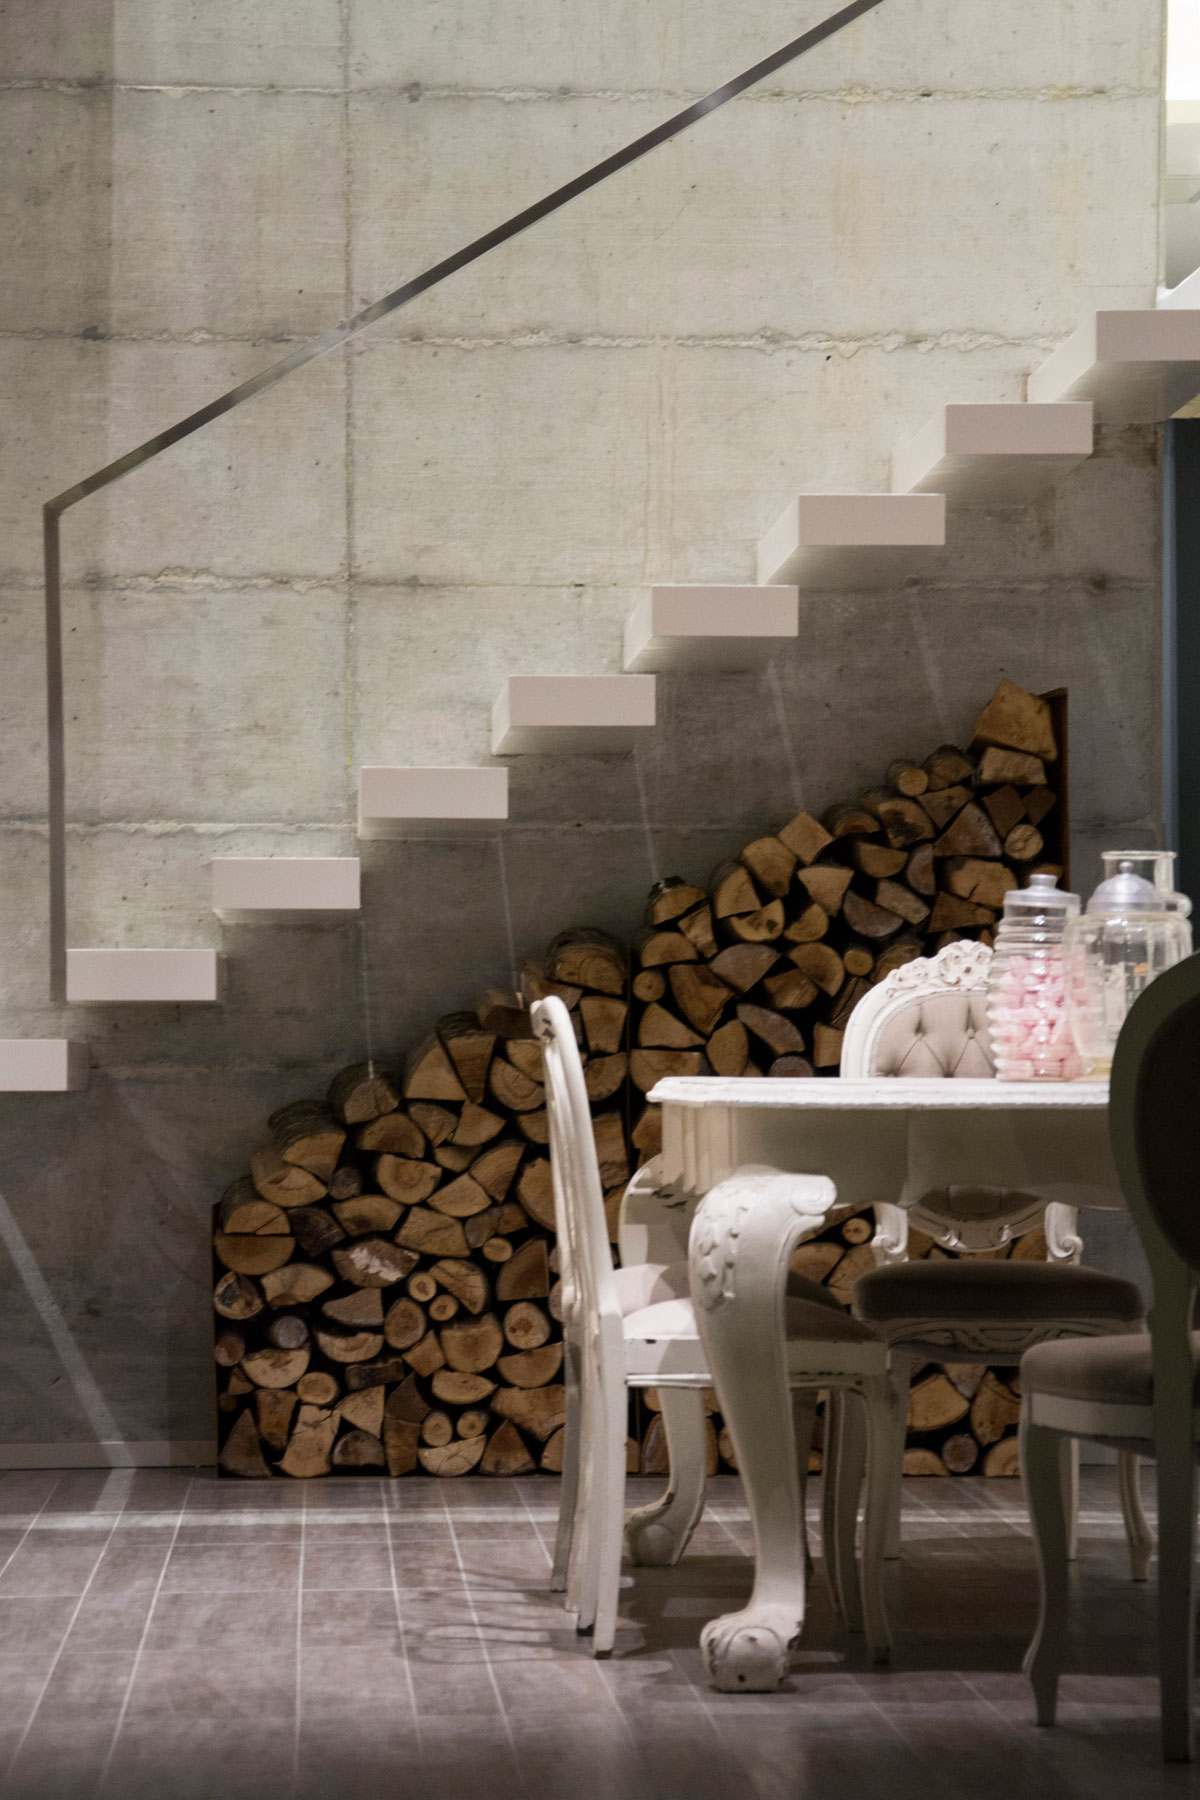 D'Autore Residence near Bologna by Giraldi Associati Architetti-28